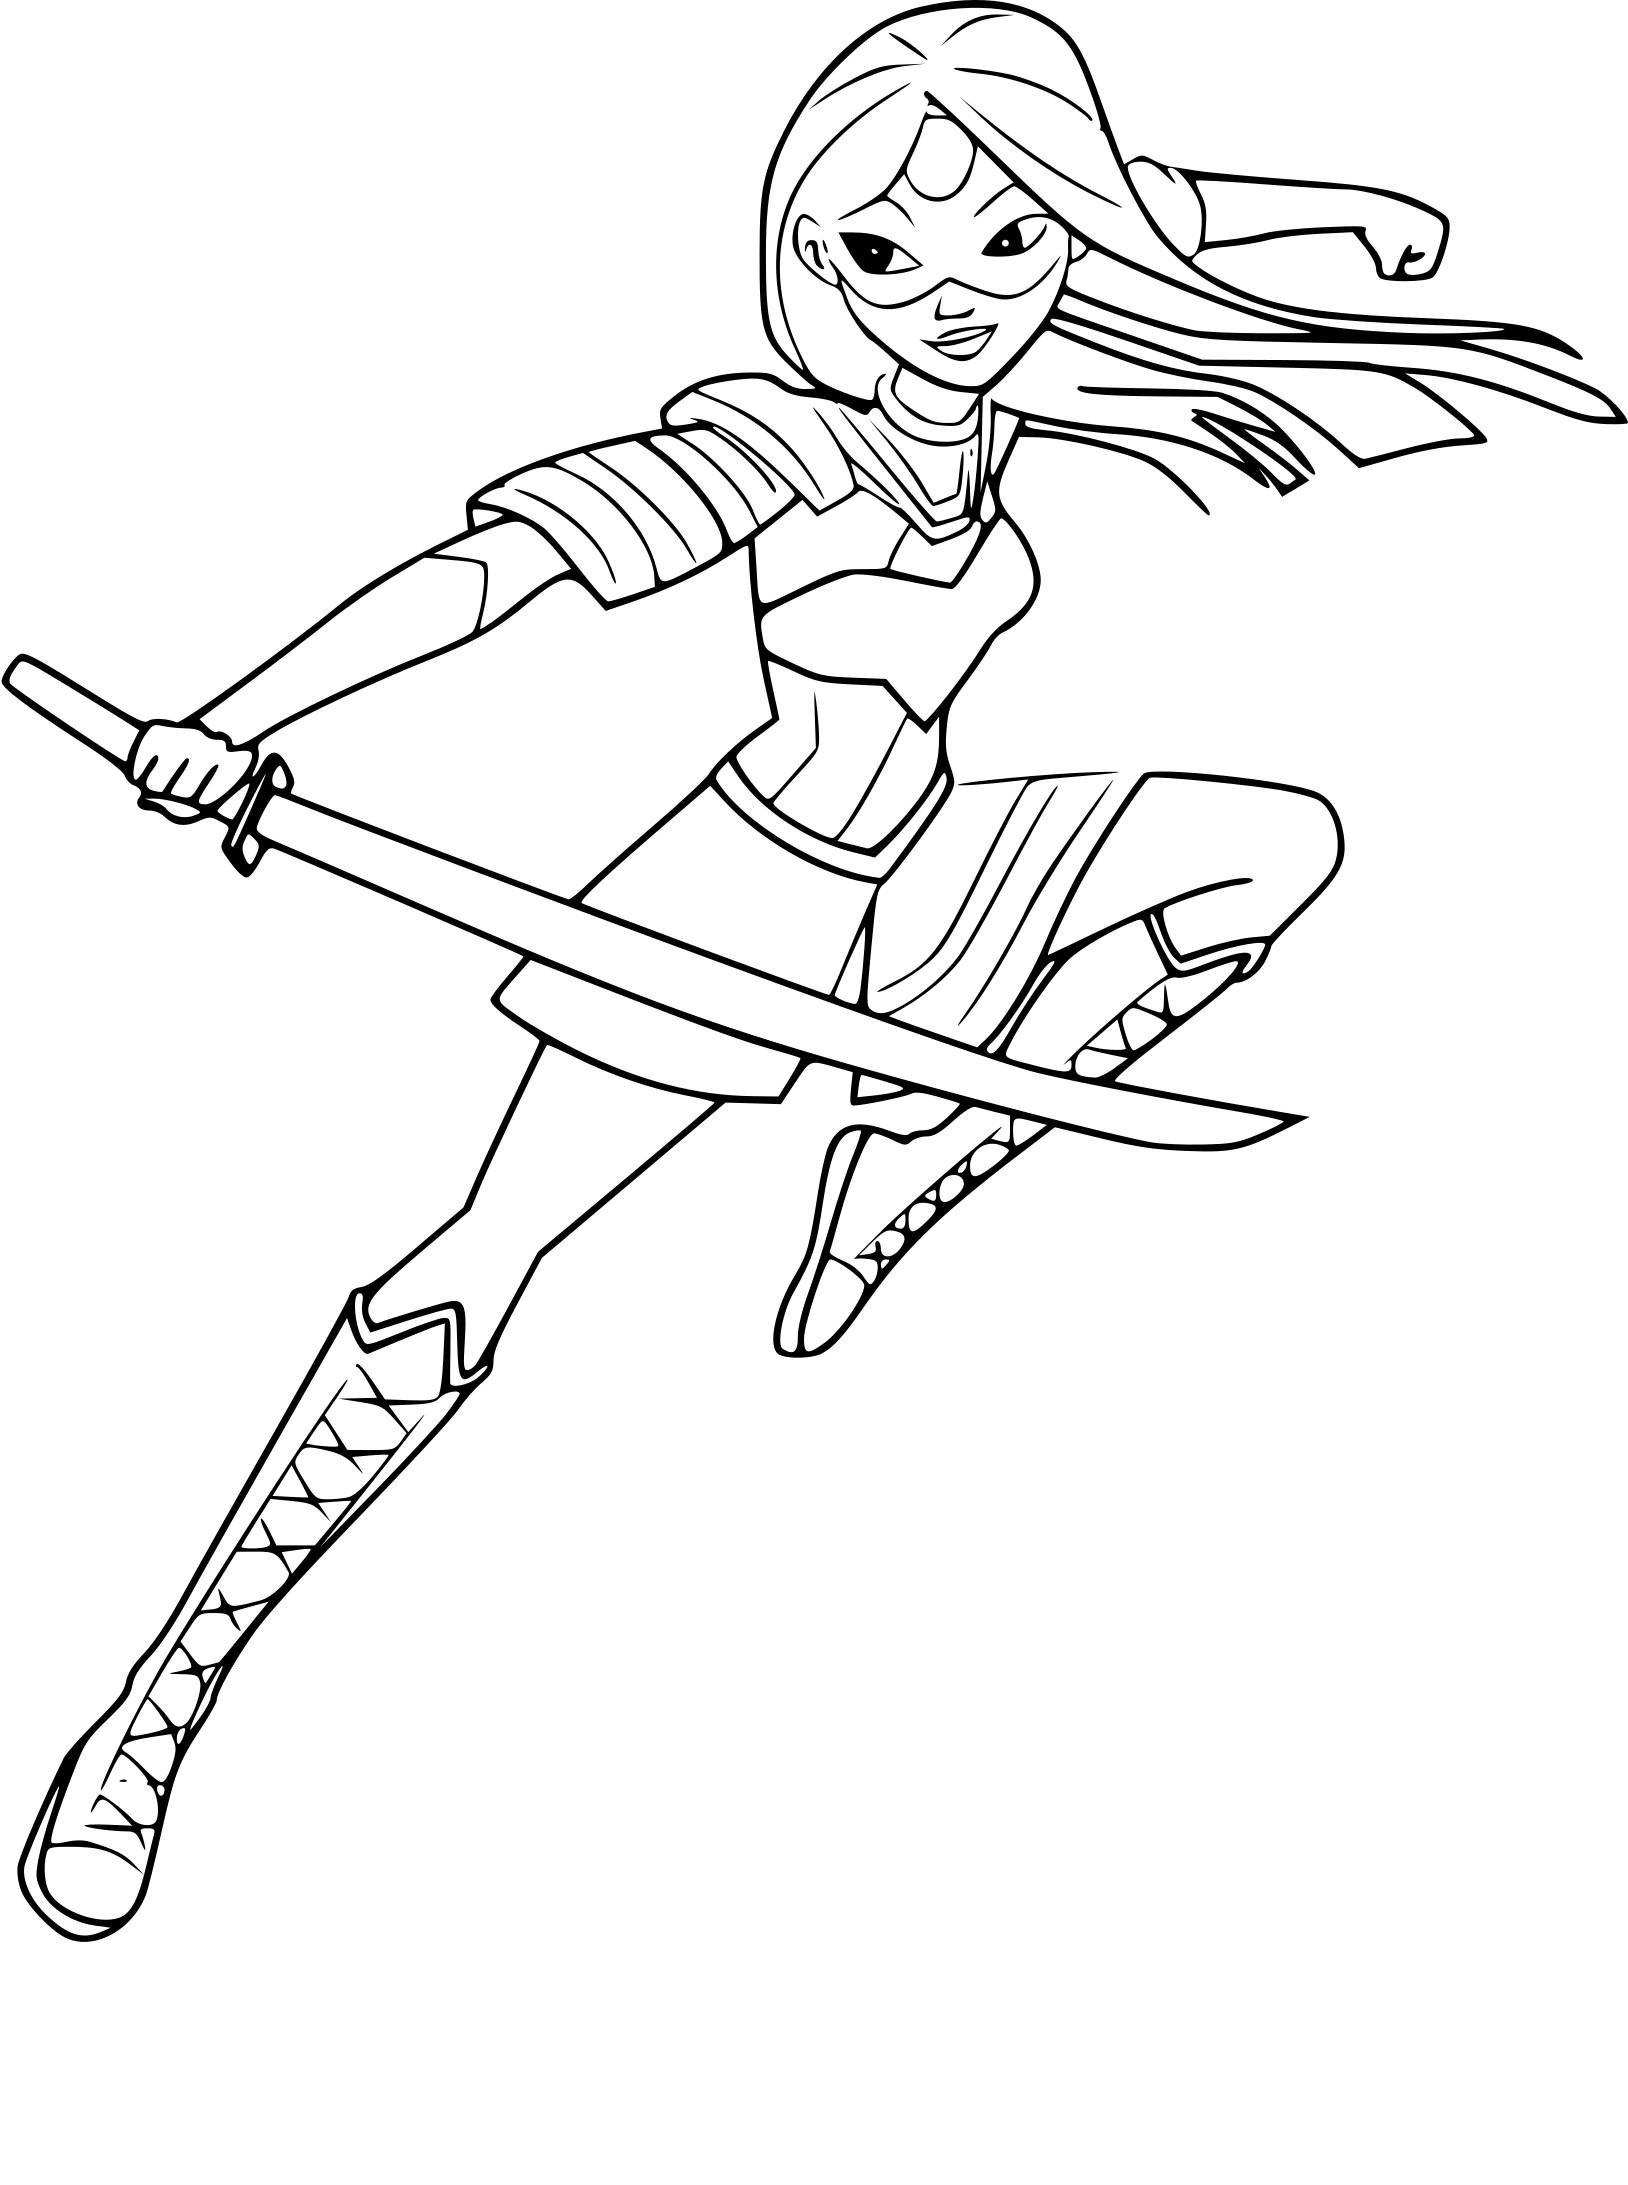 Coloriage Katana Super Héroïne à Imprimer